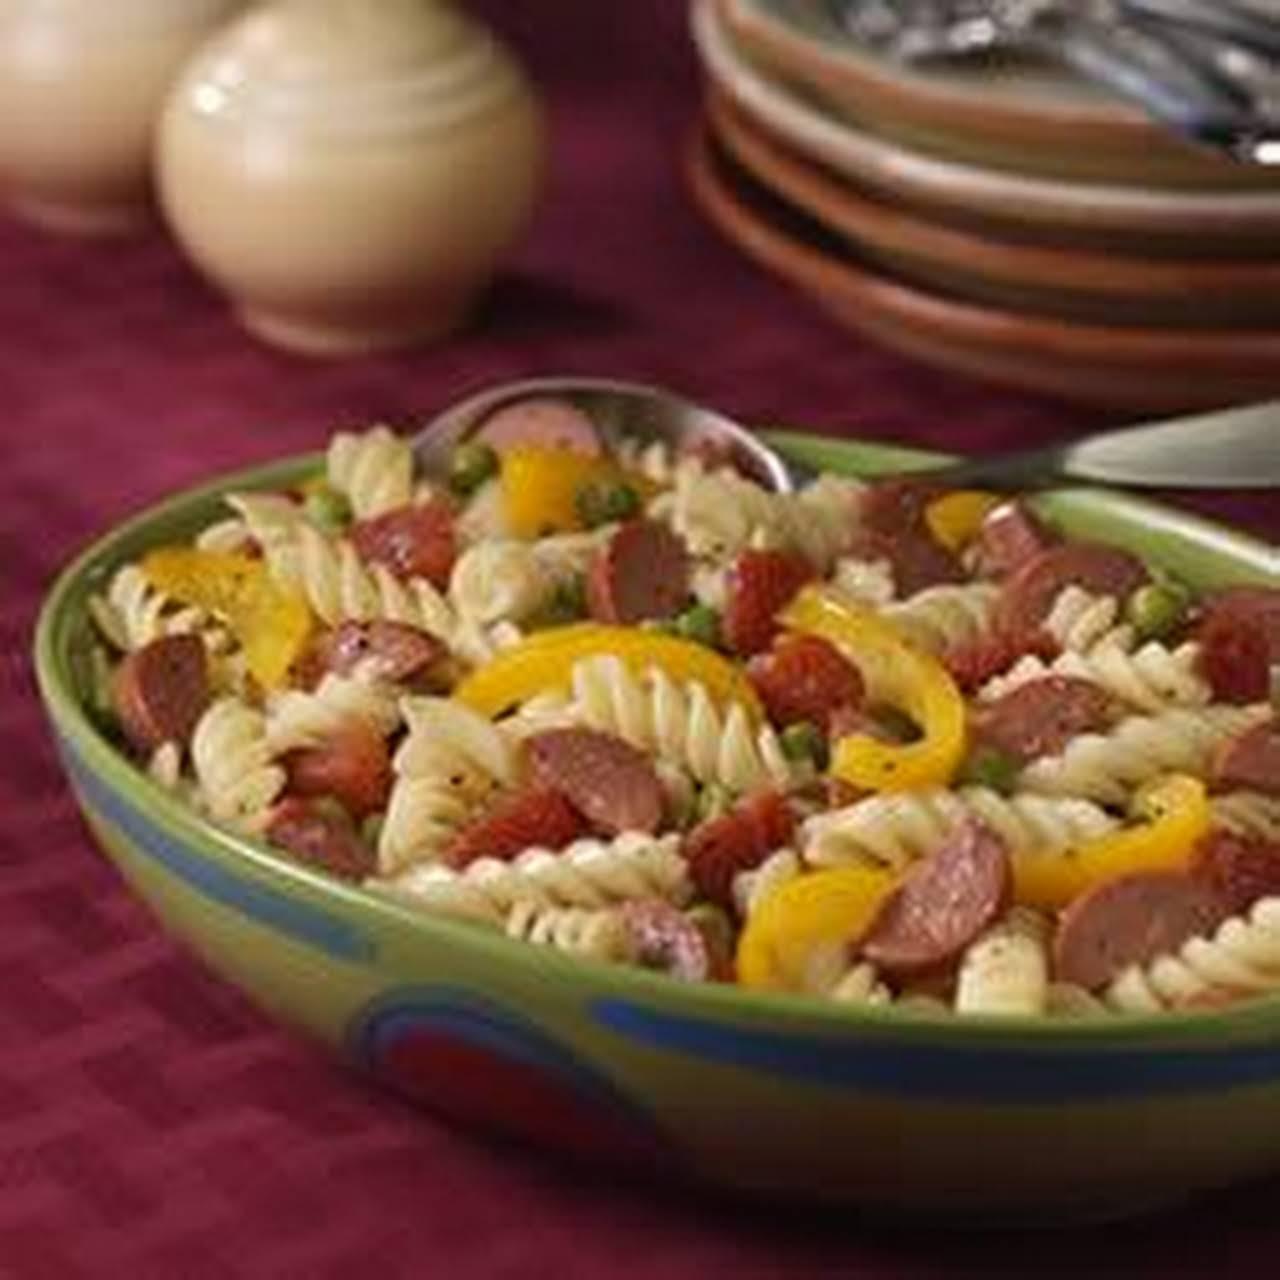 Hearty Pasta Dinner Salad